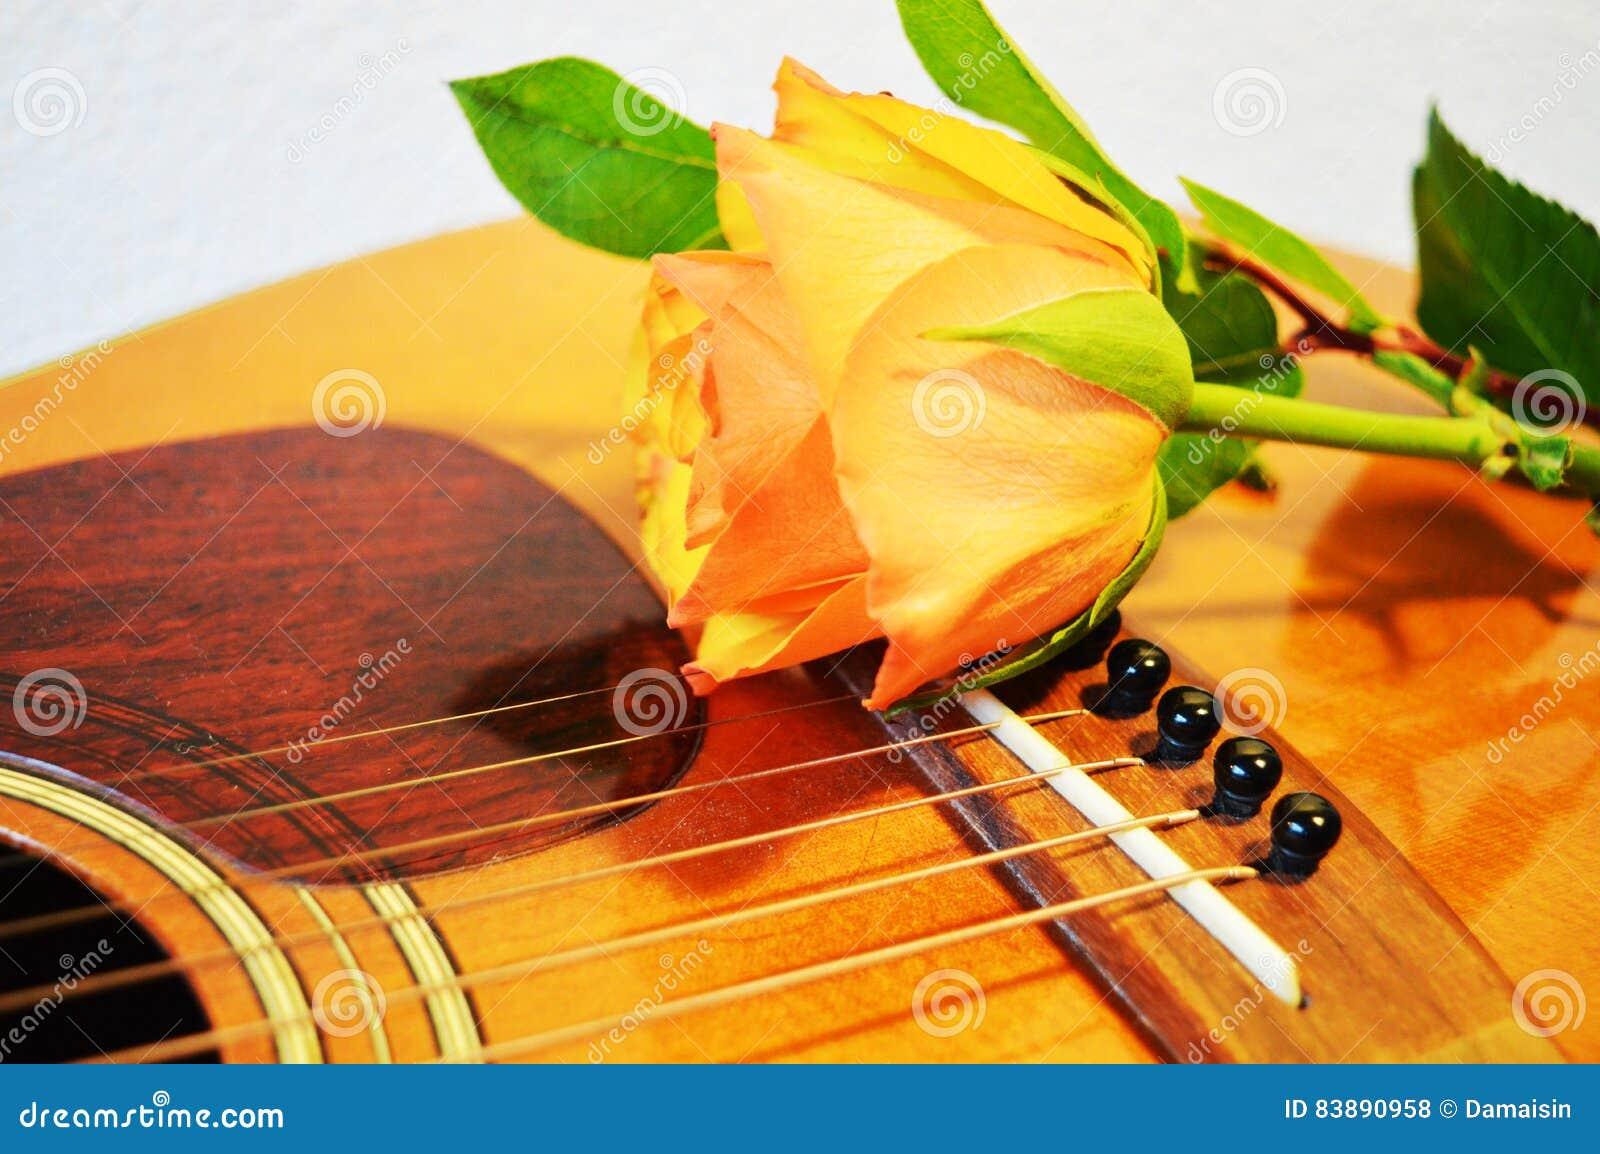 Singing For Love Symbols Stock Photo Image Of Yellow 83890958